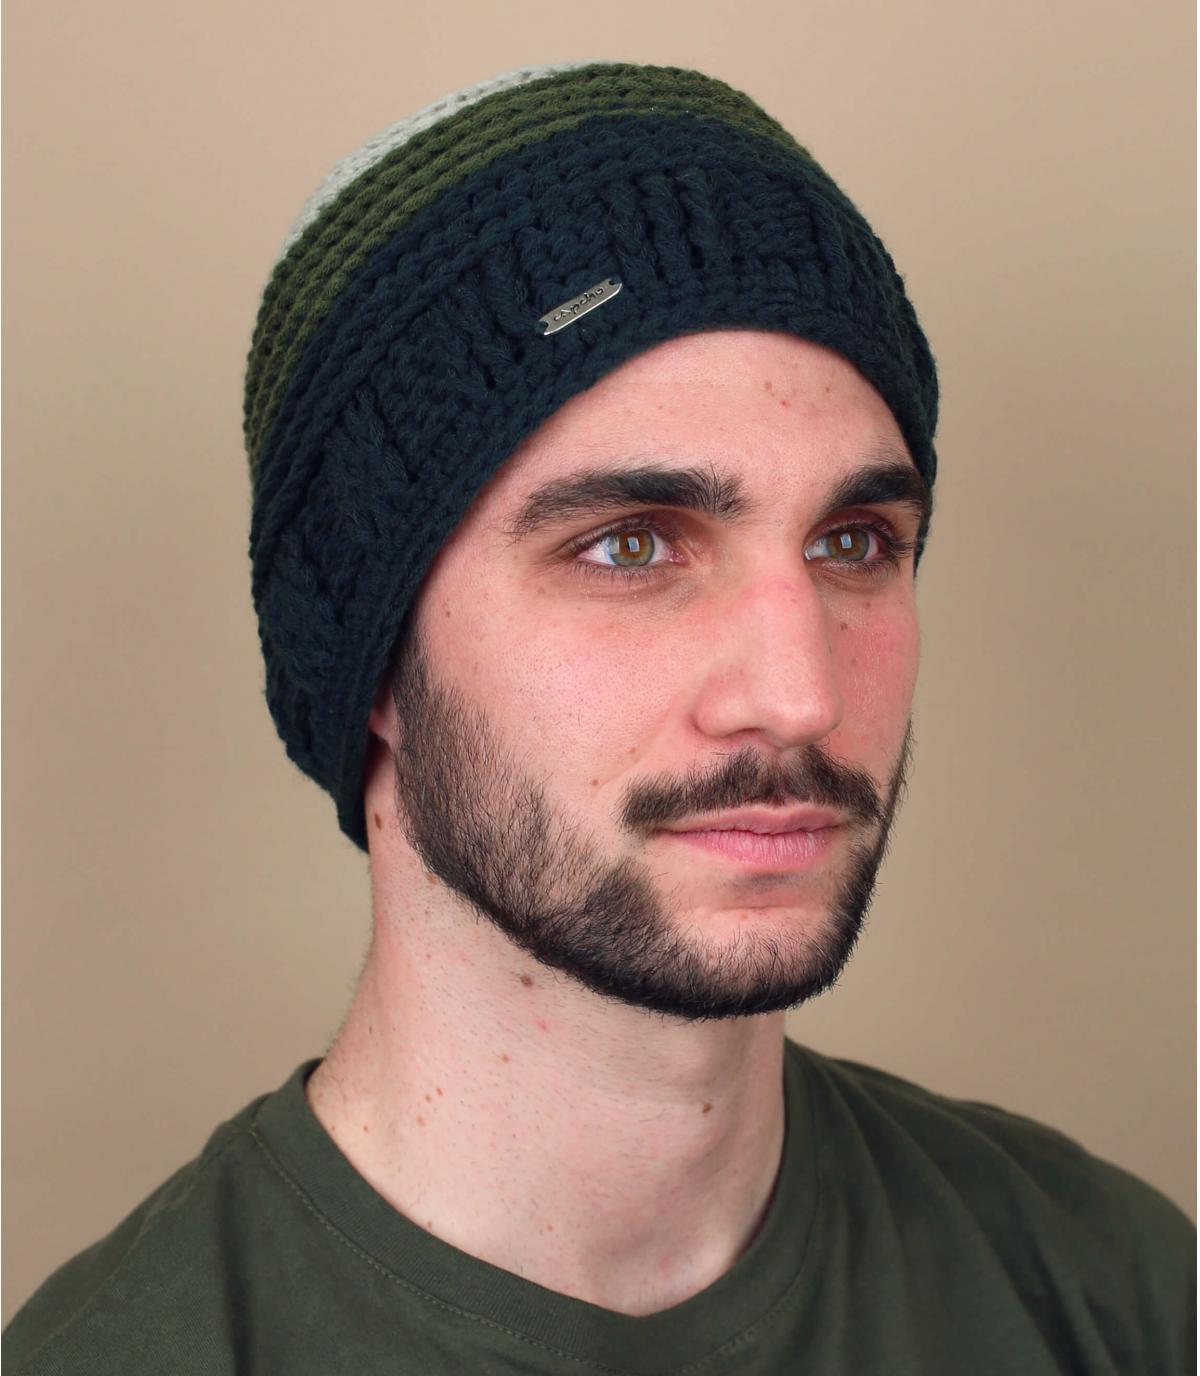 bonnet dégradé vert